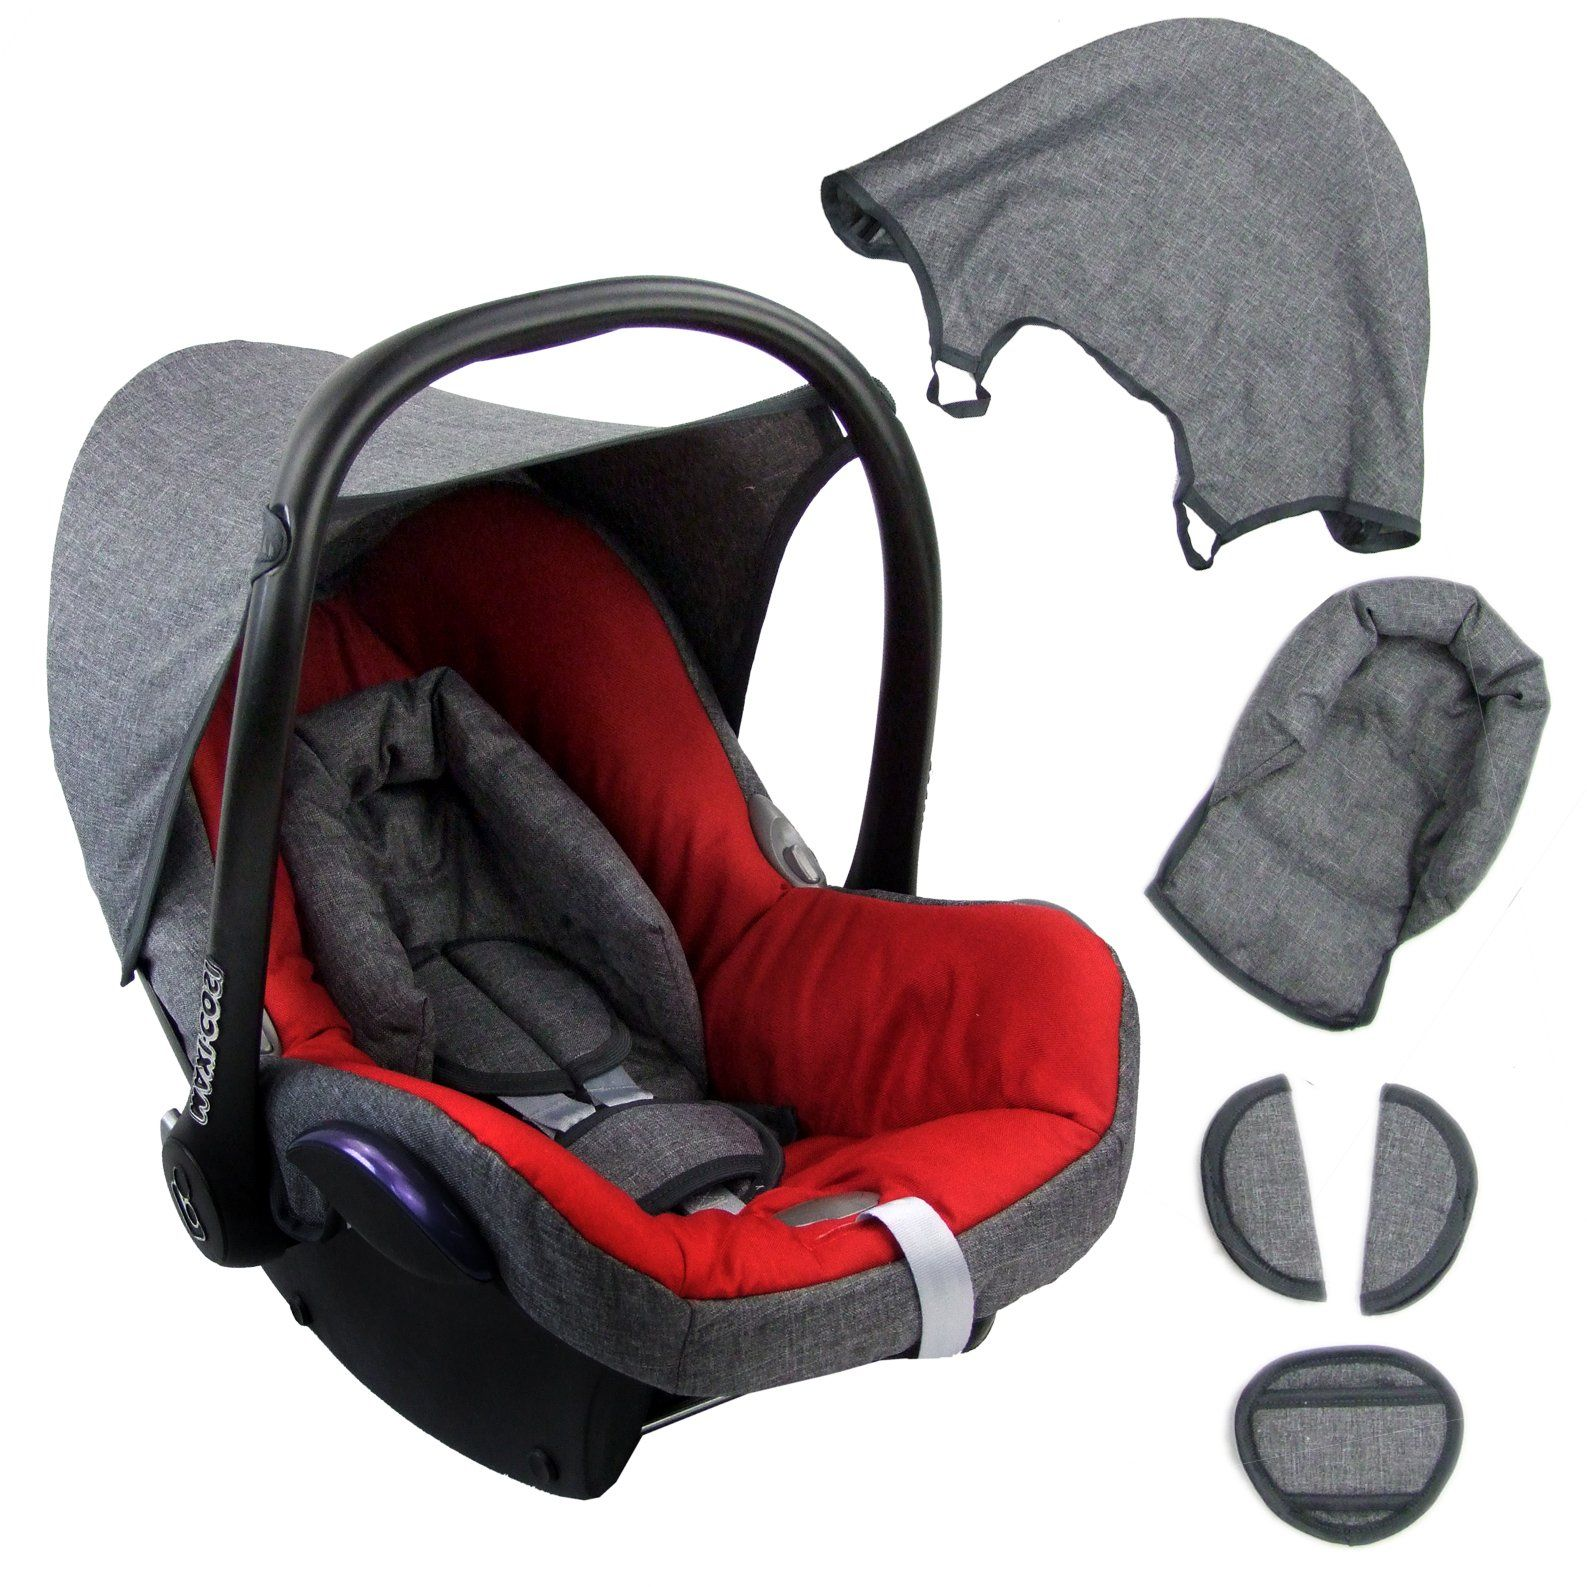 Bambiniwelt Ersatzbezug Fur Maxi Cosi Cabriofix 6 Tlg Bezug Fur Babyschale Komplett Set Sterne Marine Neu In 2020 Baby Car Seats Car Seats Baby Car